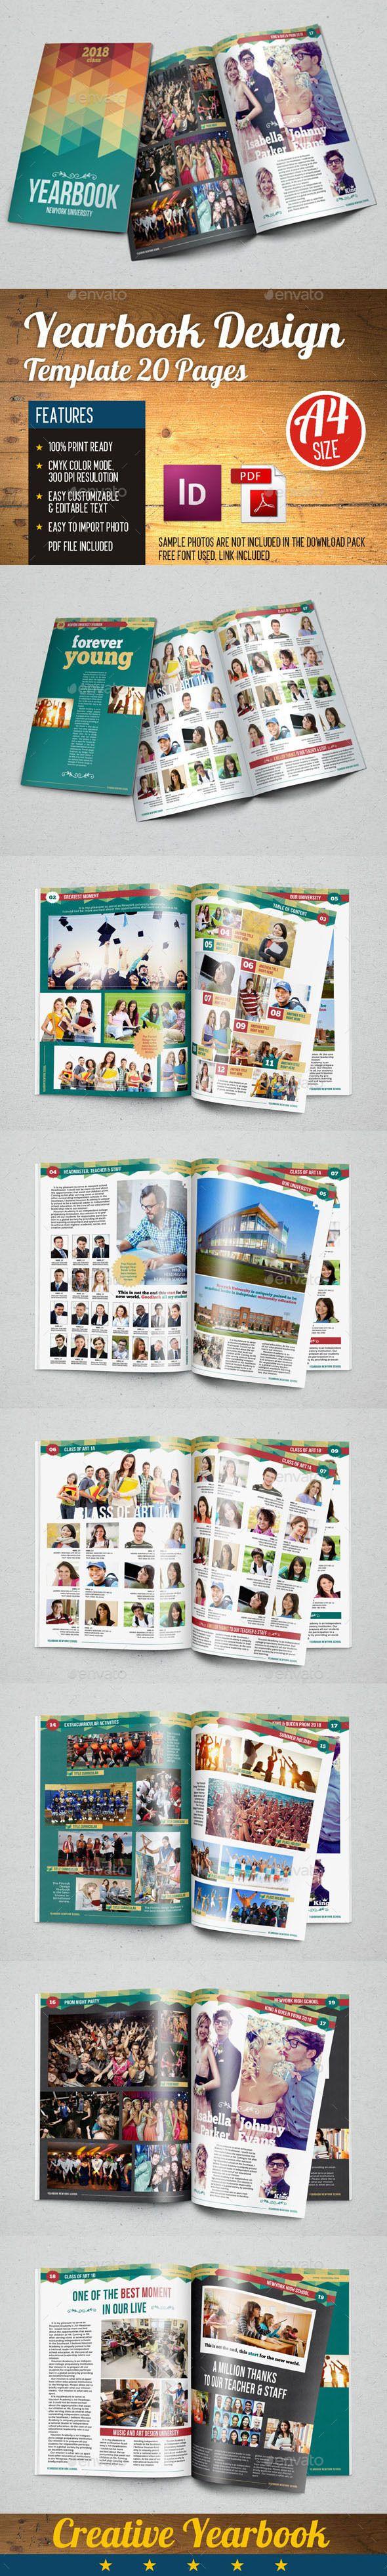 yearbook template design vol 1 pinterest yearbooks yearbook